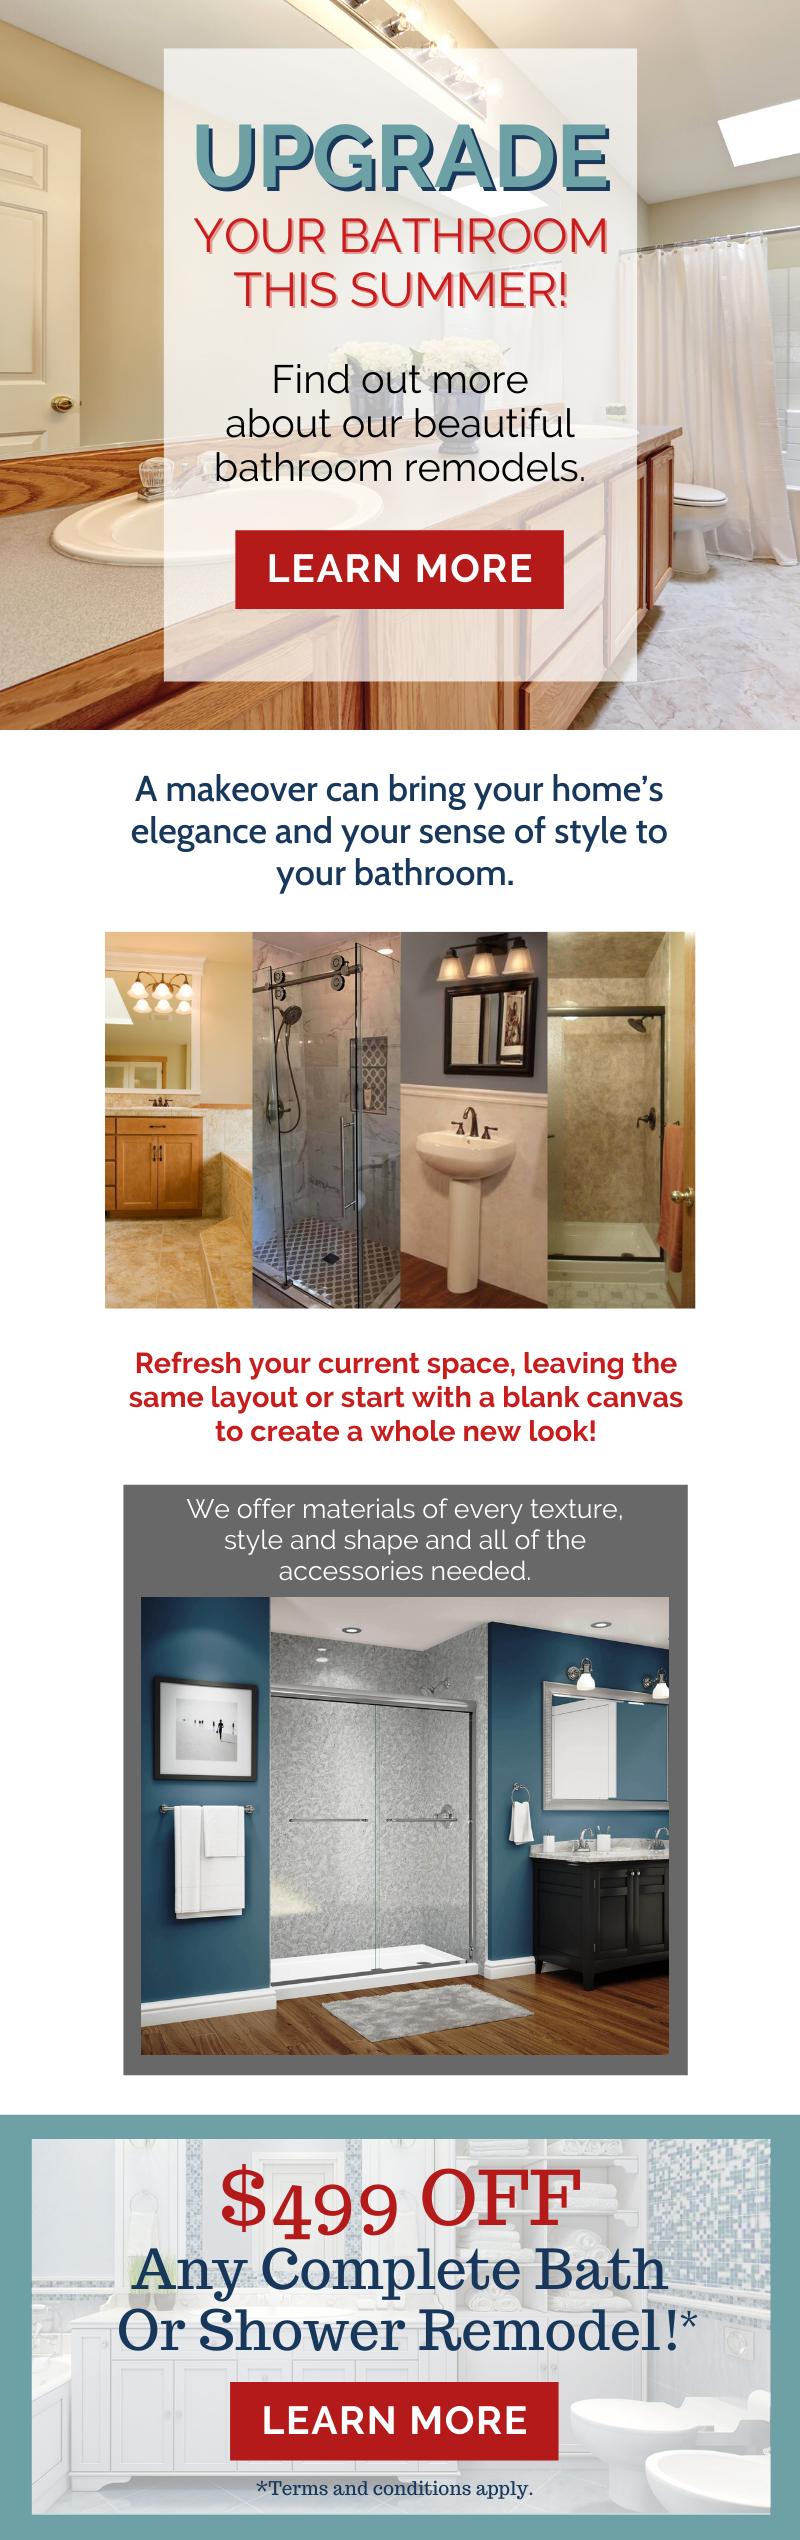 Remodel Your Bathroom! 🛁 3